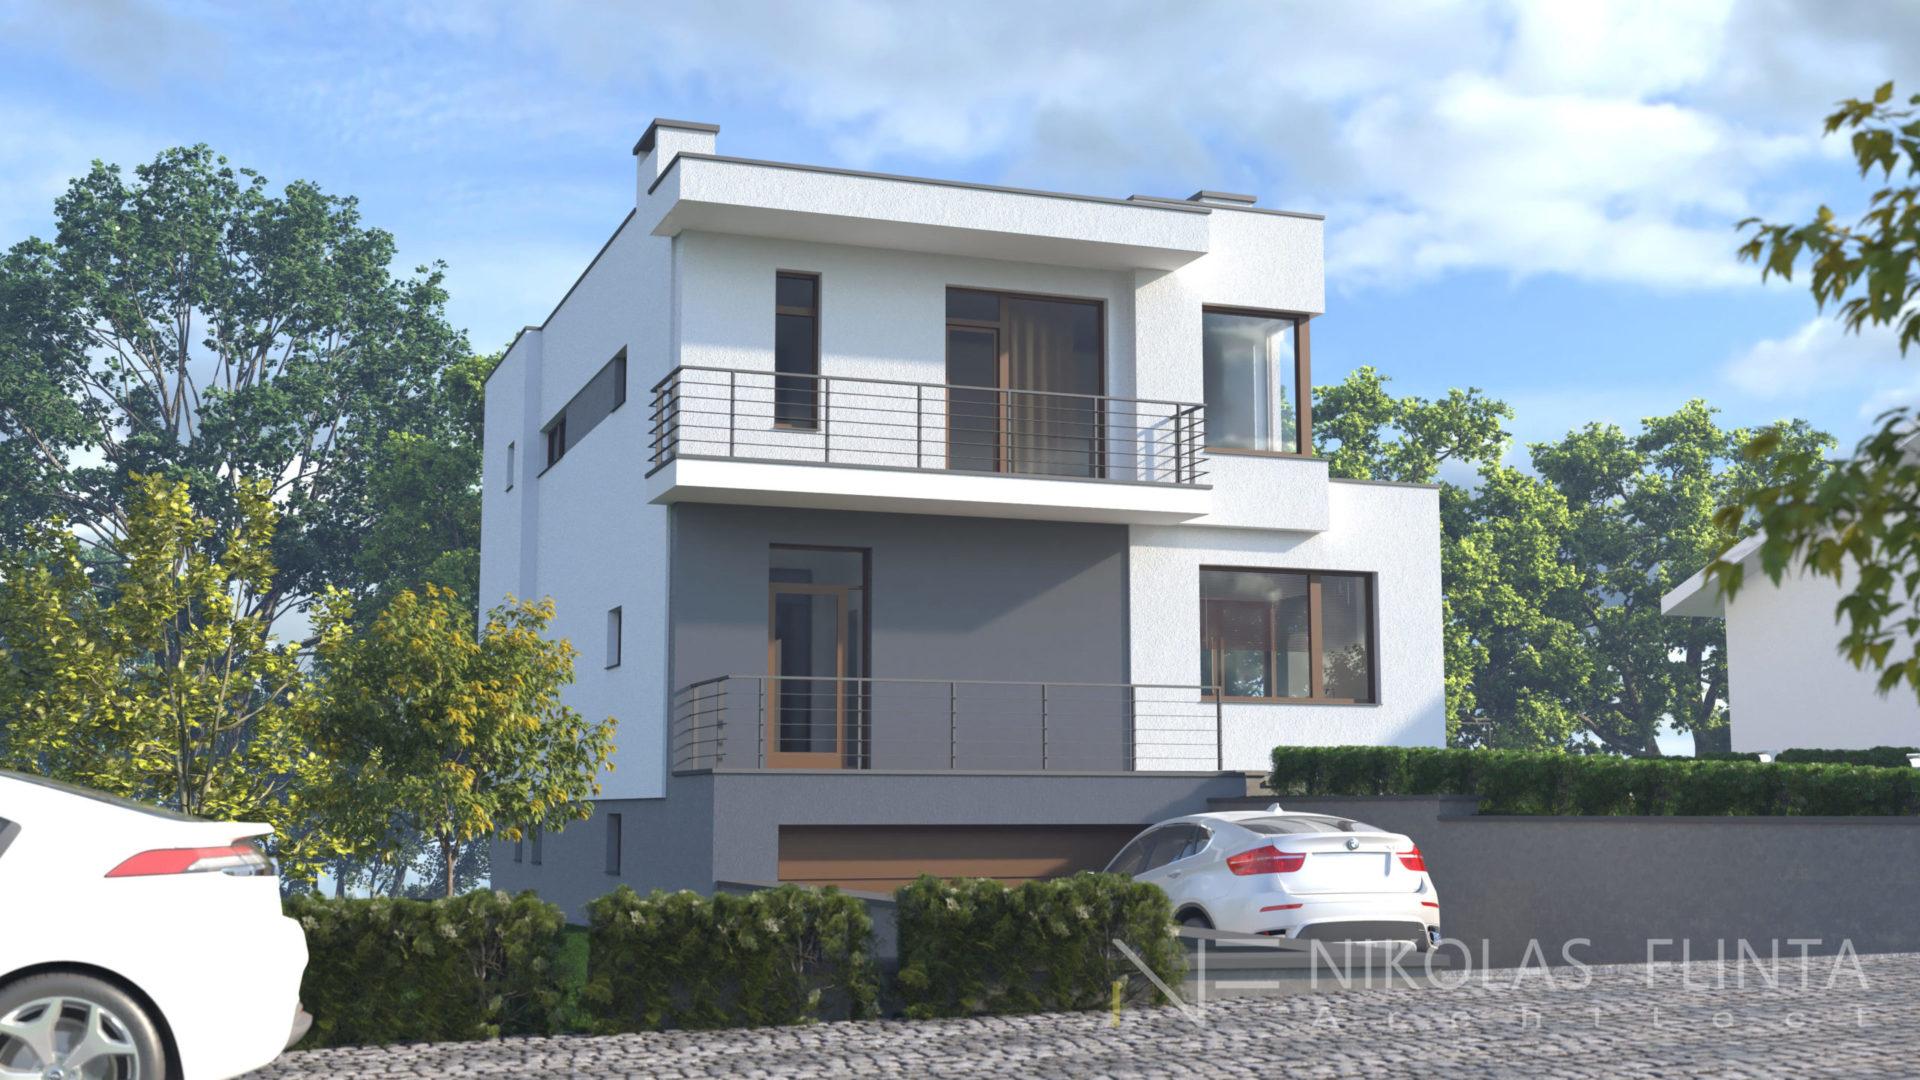 House-01KT_02-scaled.jpg